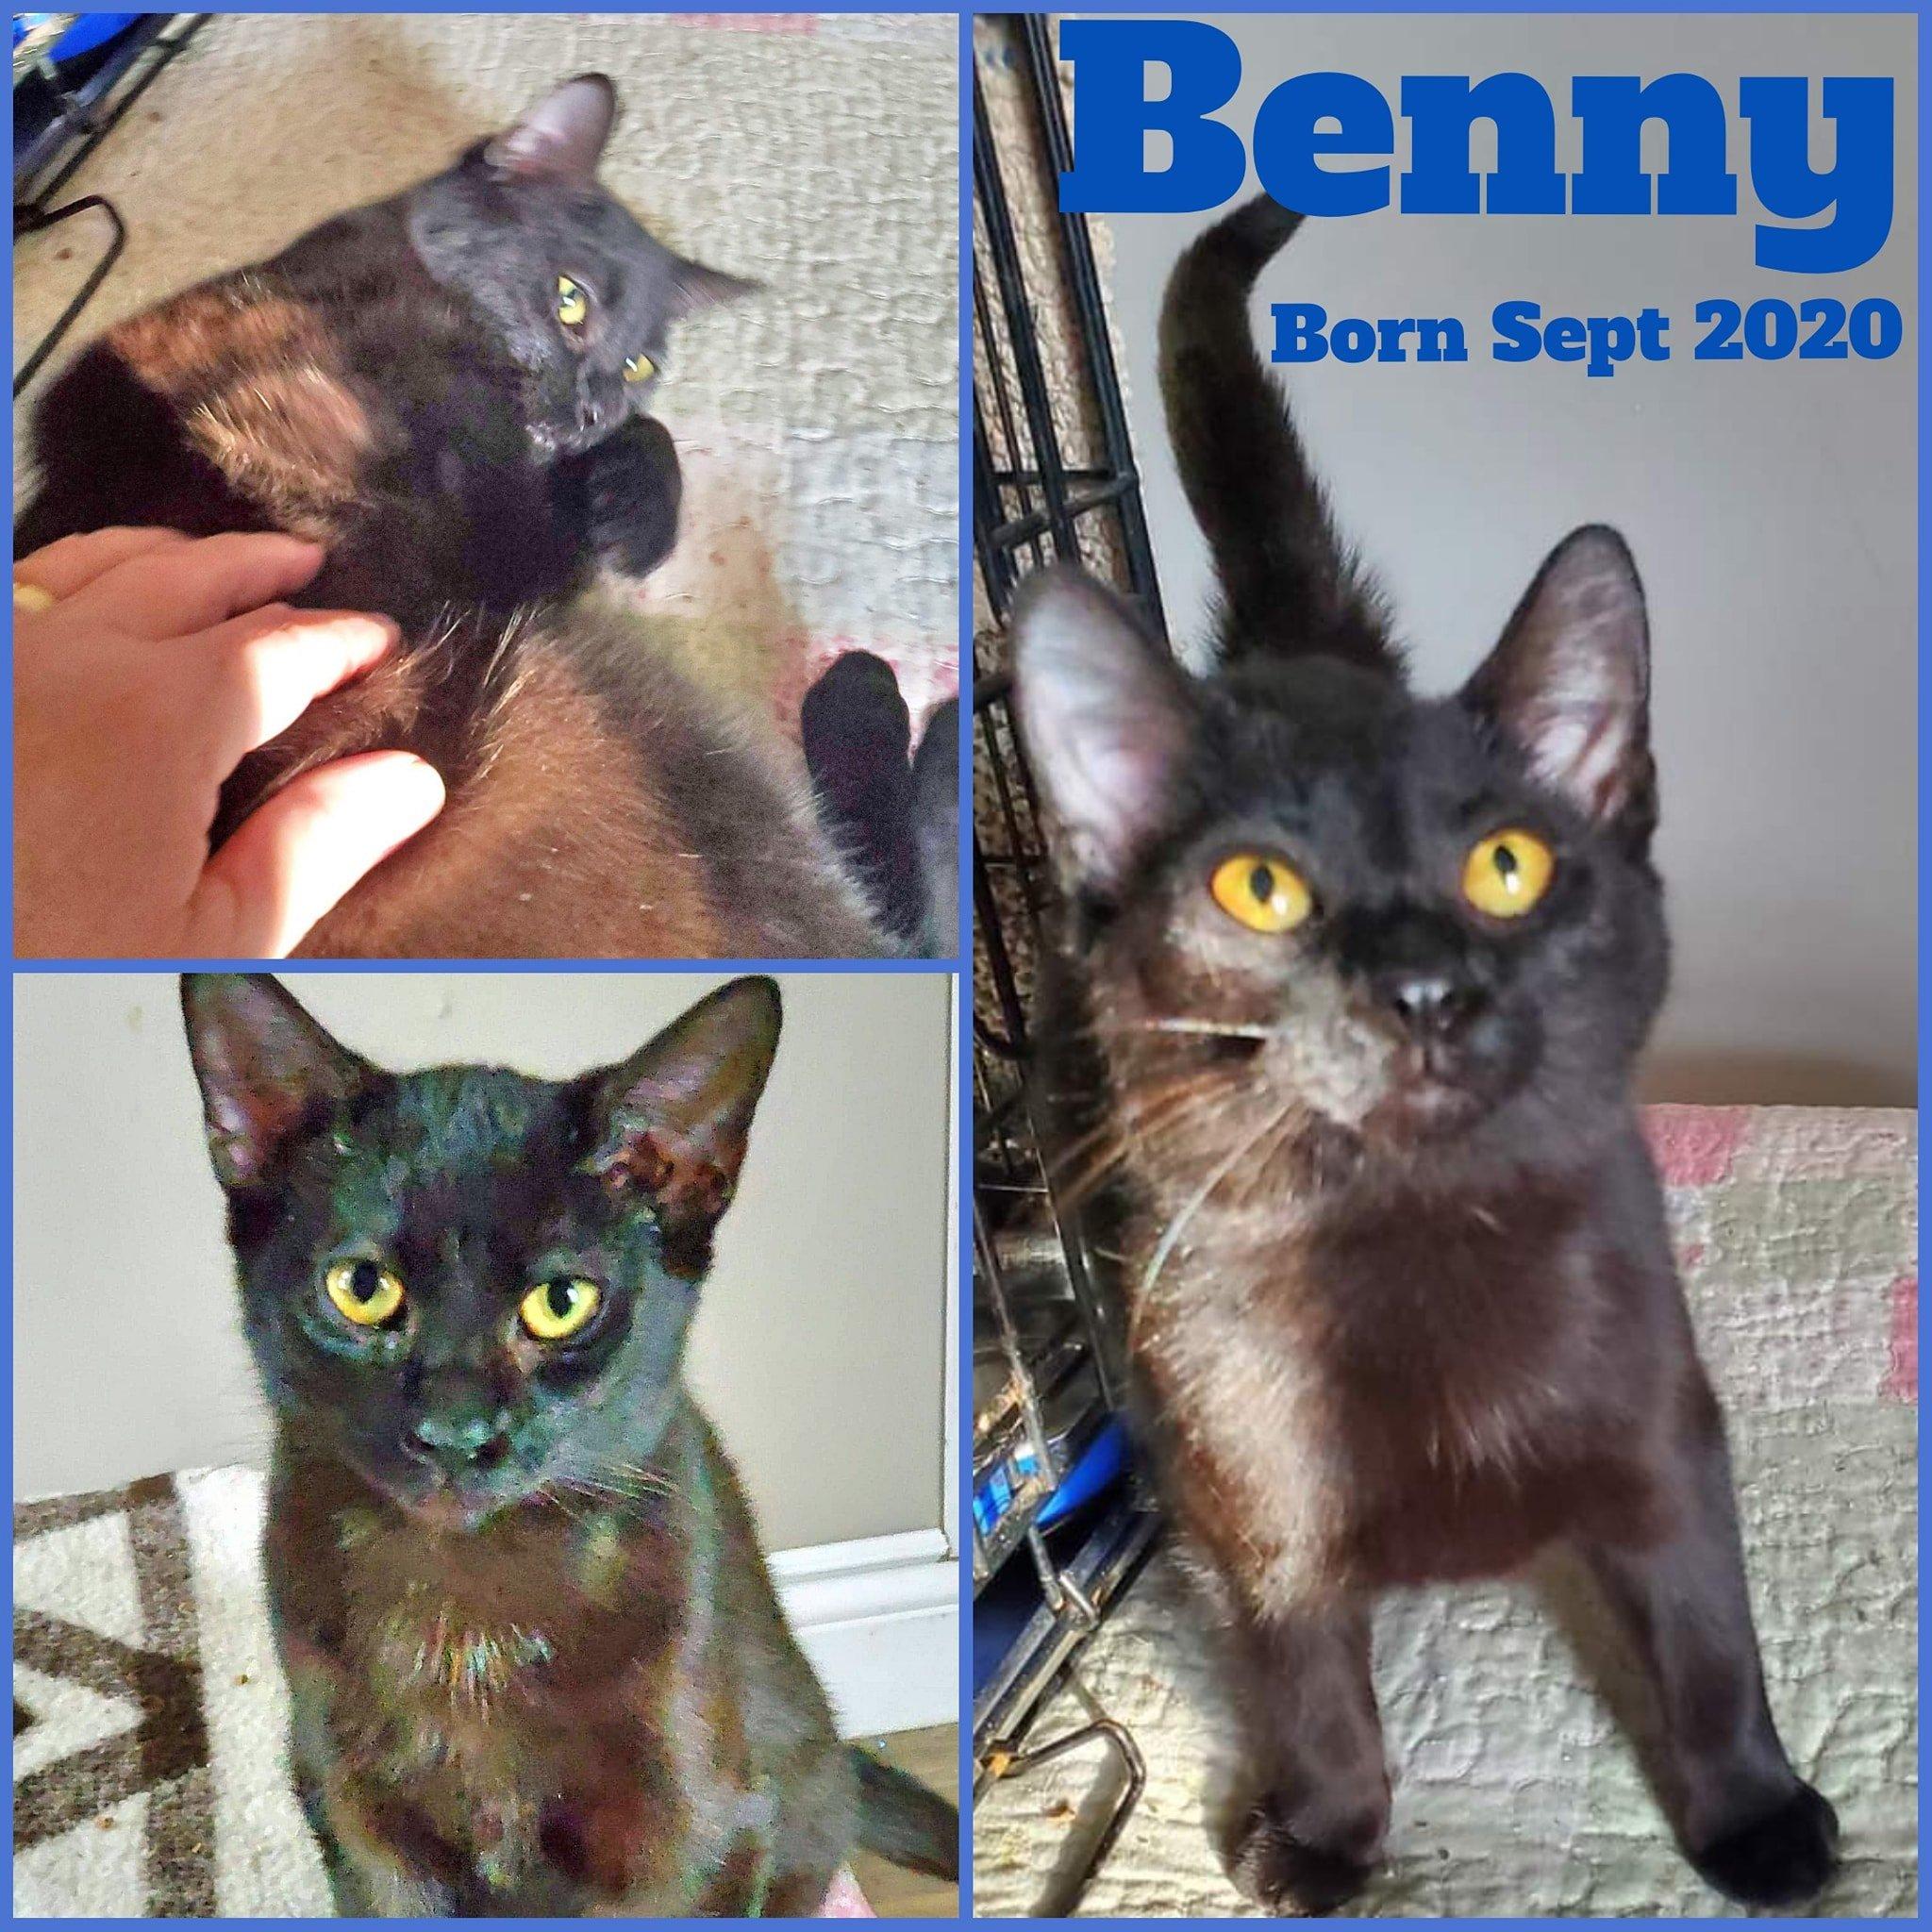 Benny-Male-Born Sept 2020